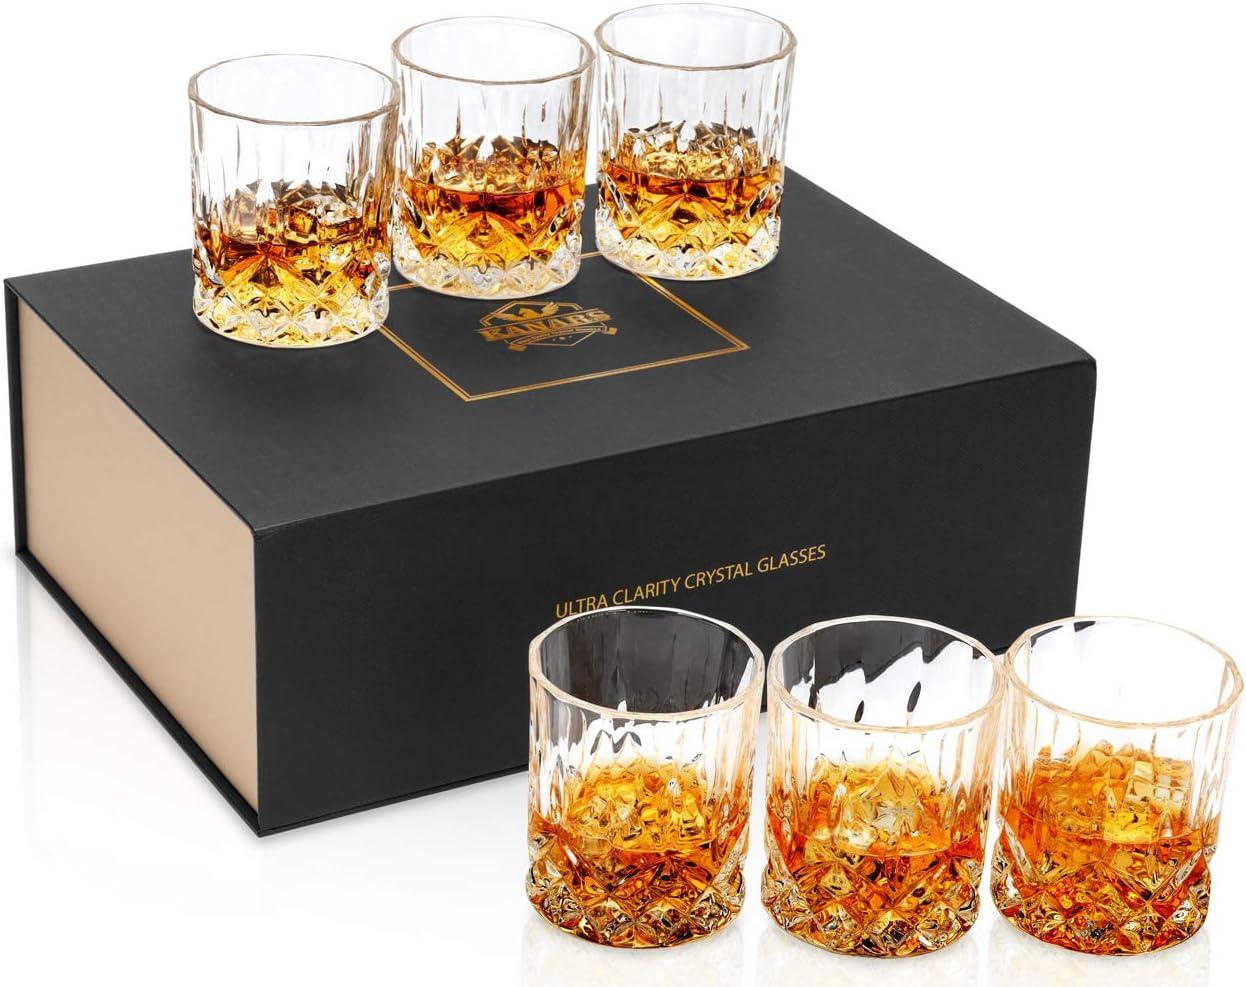 KANARS Whiskey Glasses Set of 6 with Elegant Gift Box,10 Oz Premium Old Fashioned Crystal Glass Tumbler for Liquor, Scotch, Cocktail or Bourbon Drinking Tasting